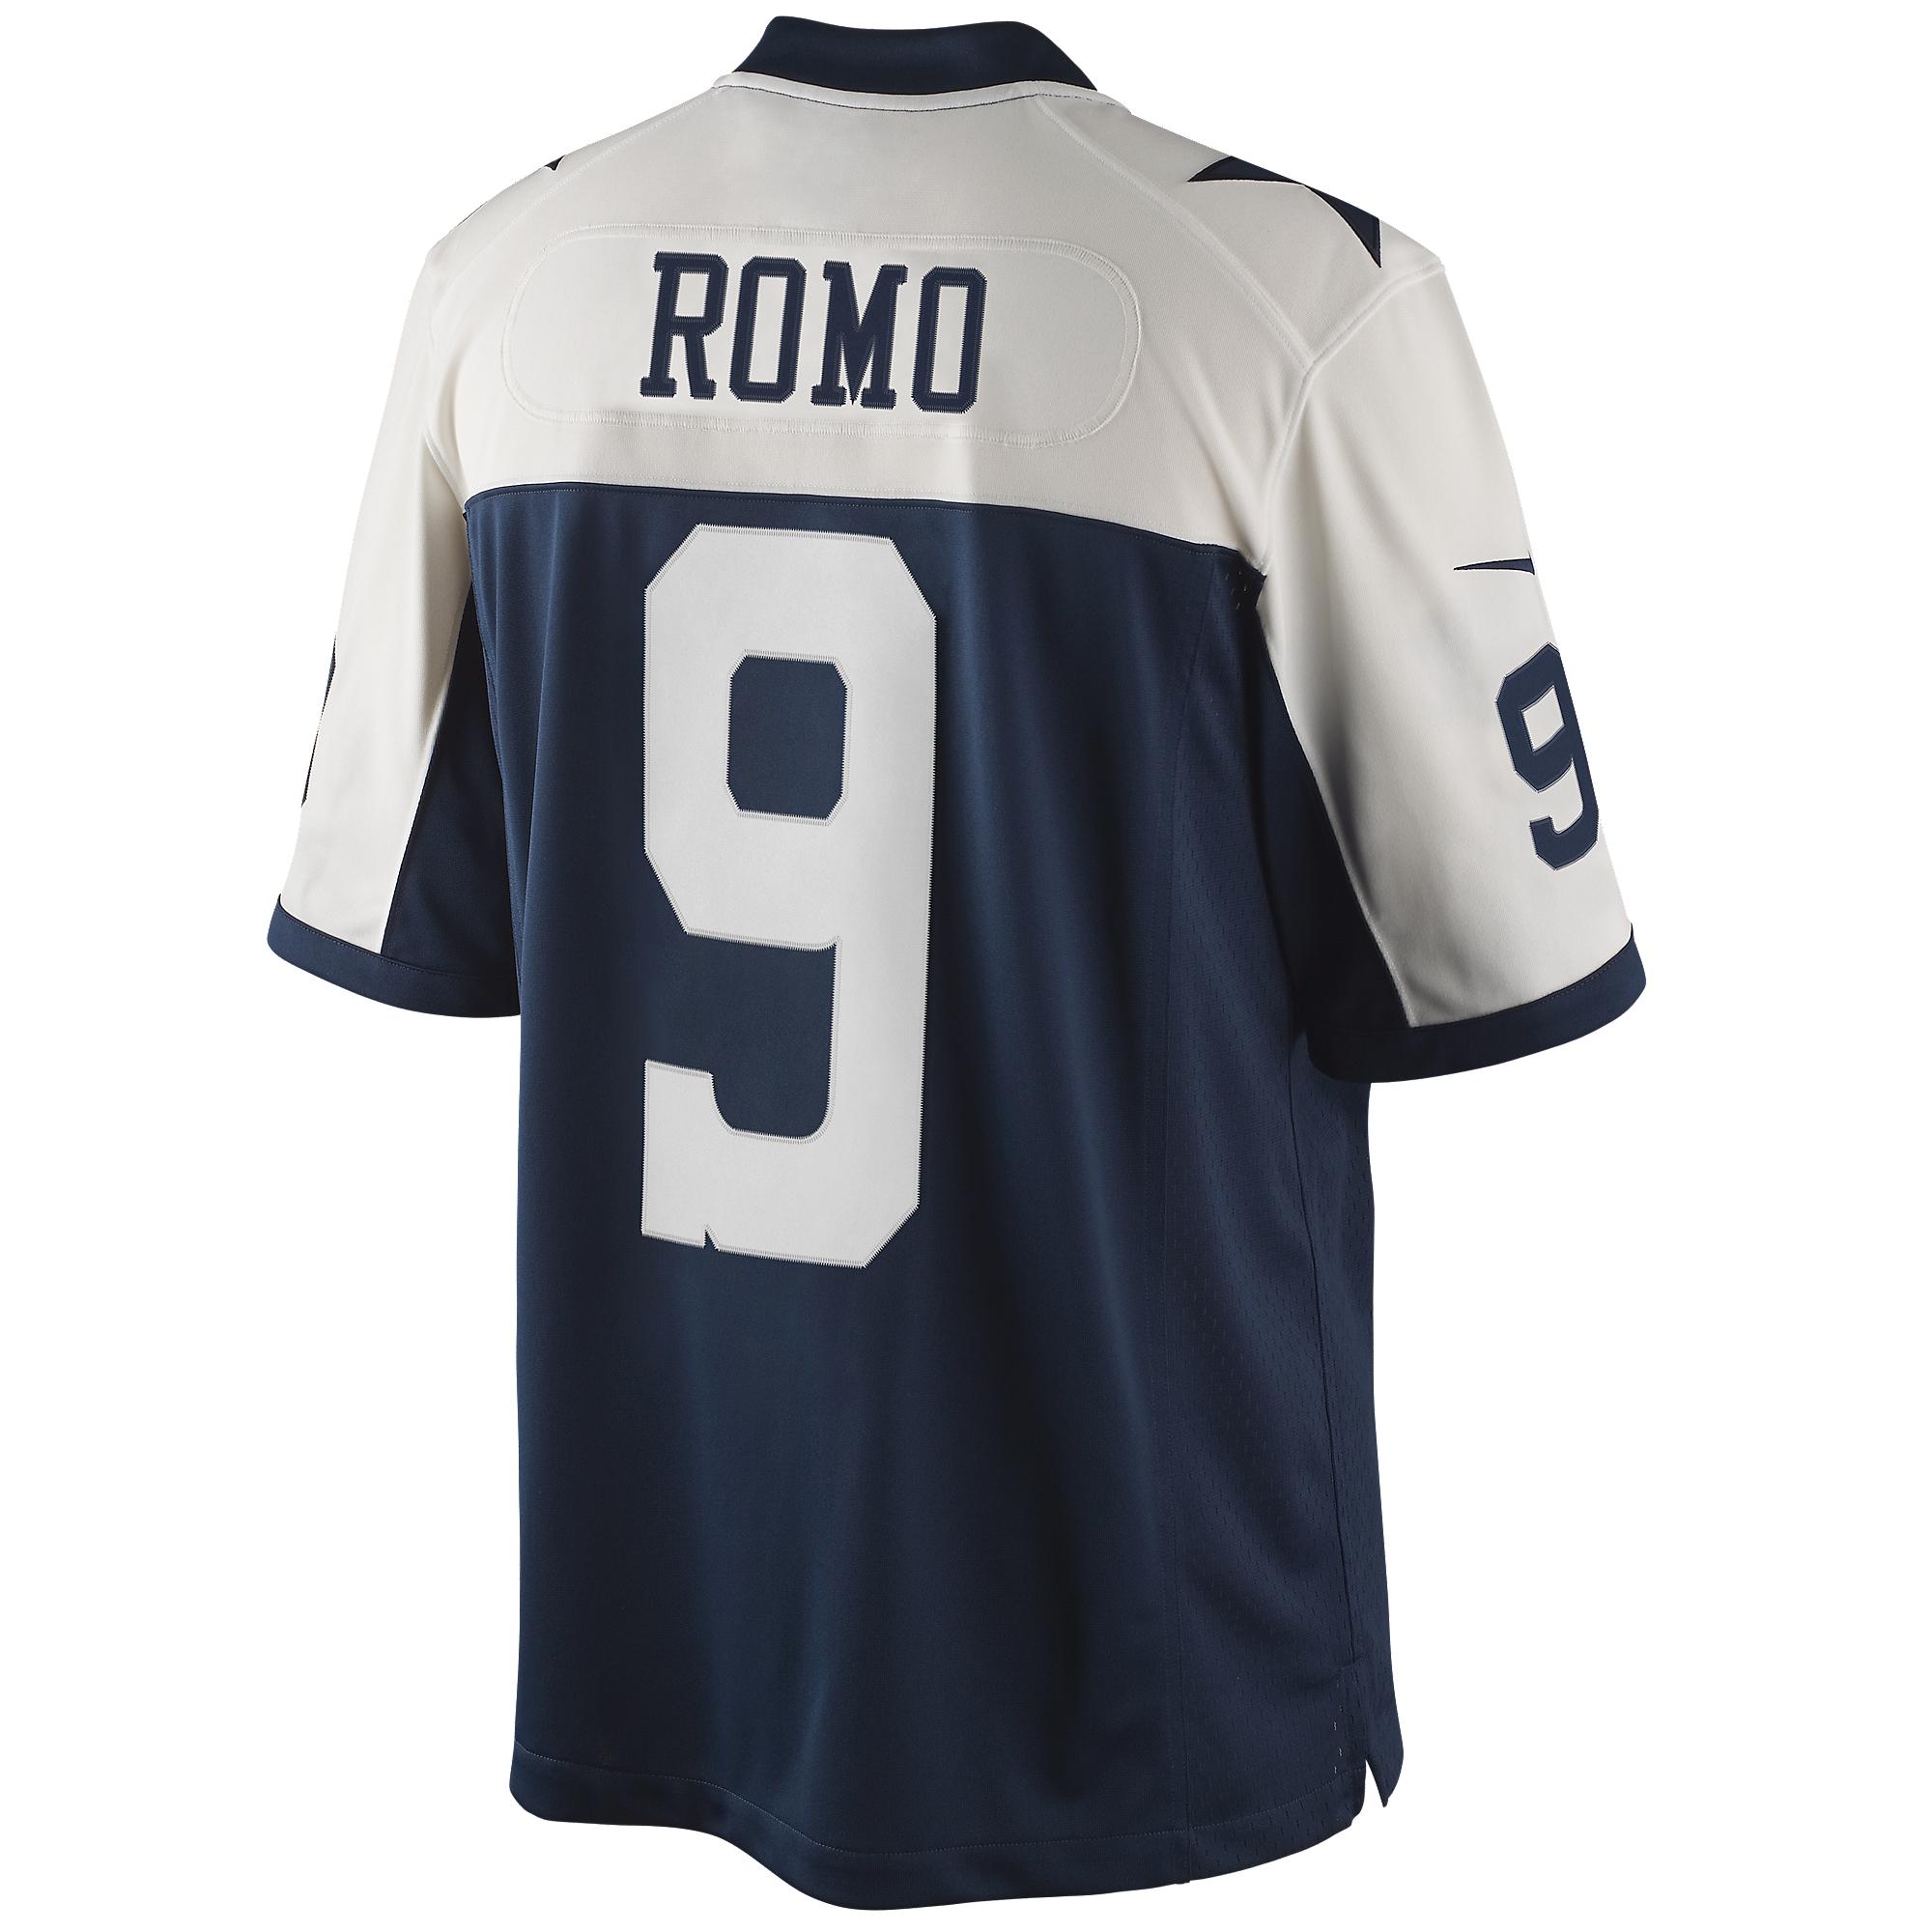 online retailer bc3ed 30bd3 Dallas Cowboys Romo Nike Limited Throwback Jersey 3XL\-4XL